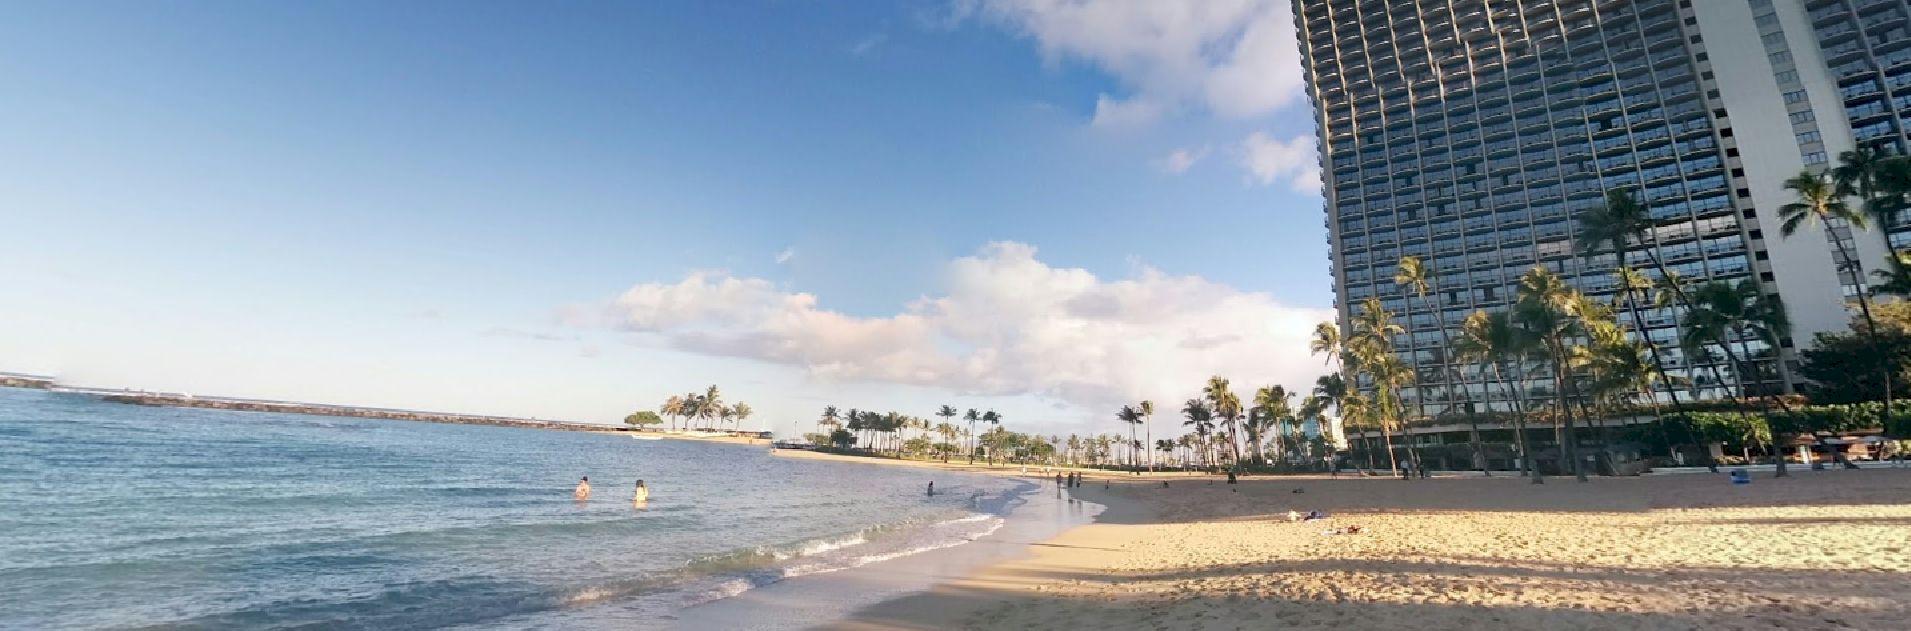 Hilton Hawaiian Village Oahu